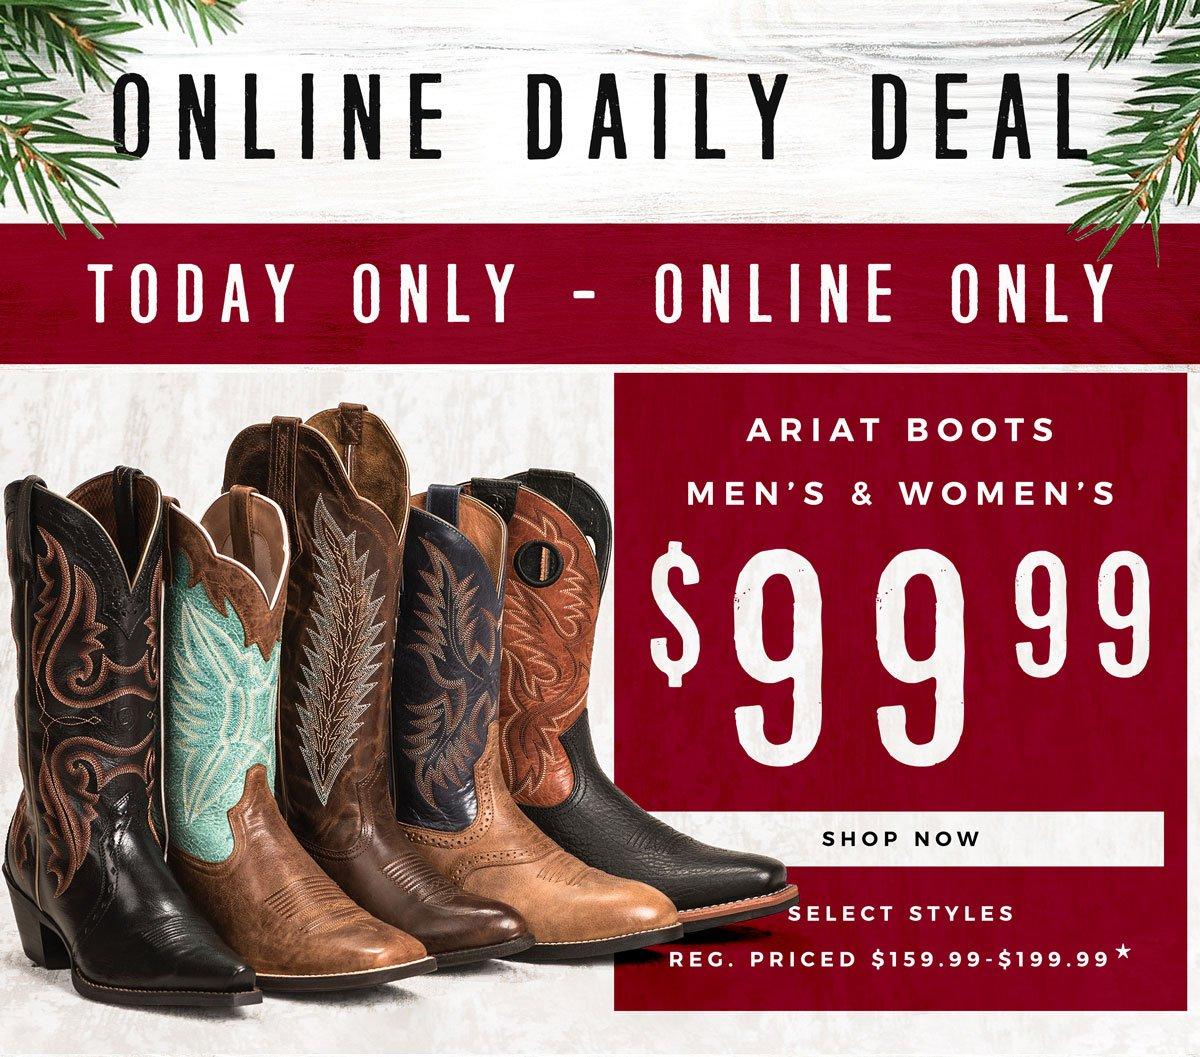 Ariat Boots Coupon